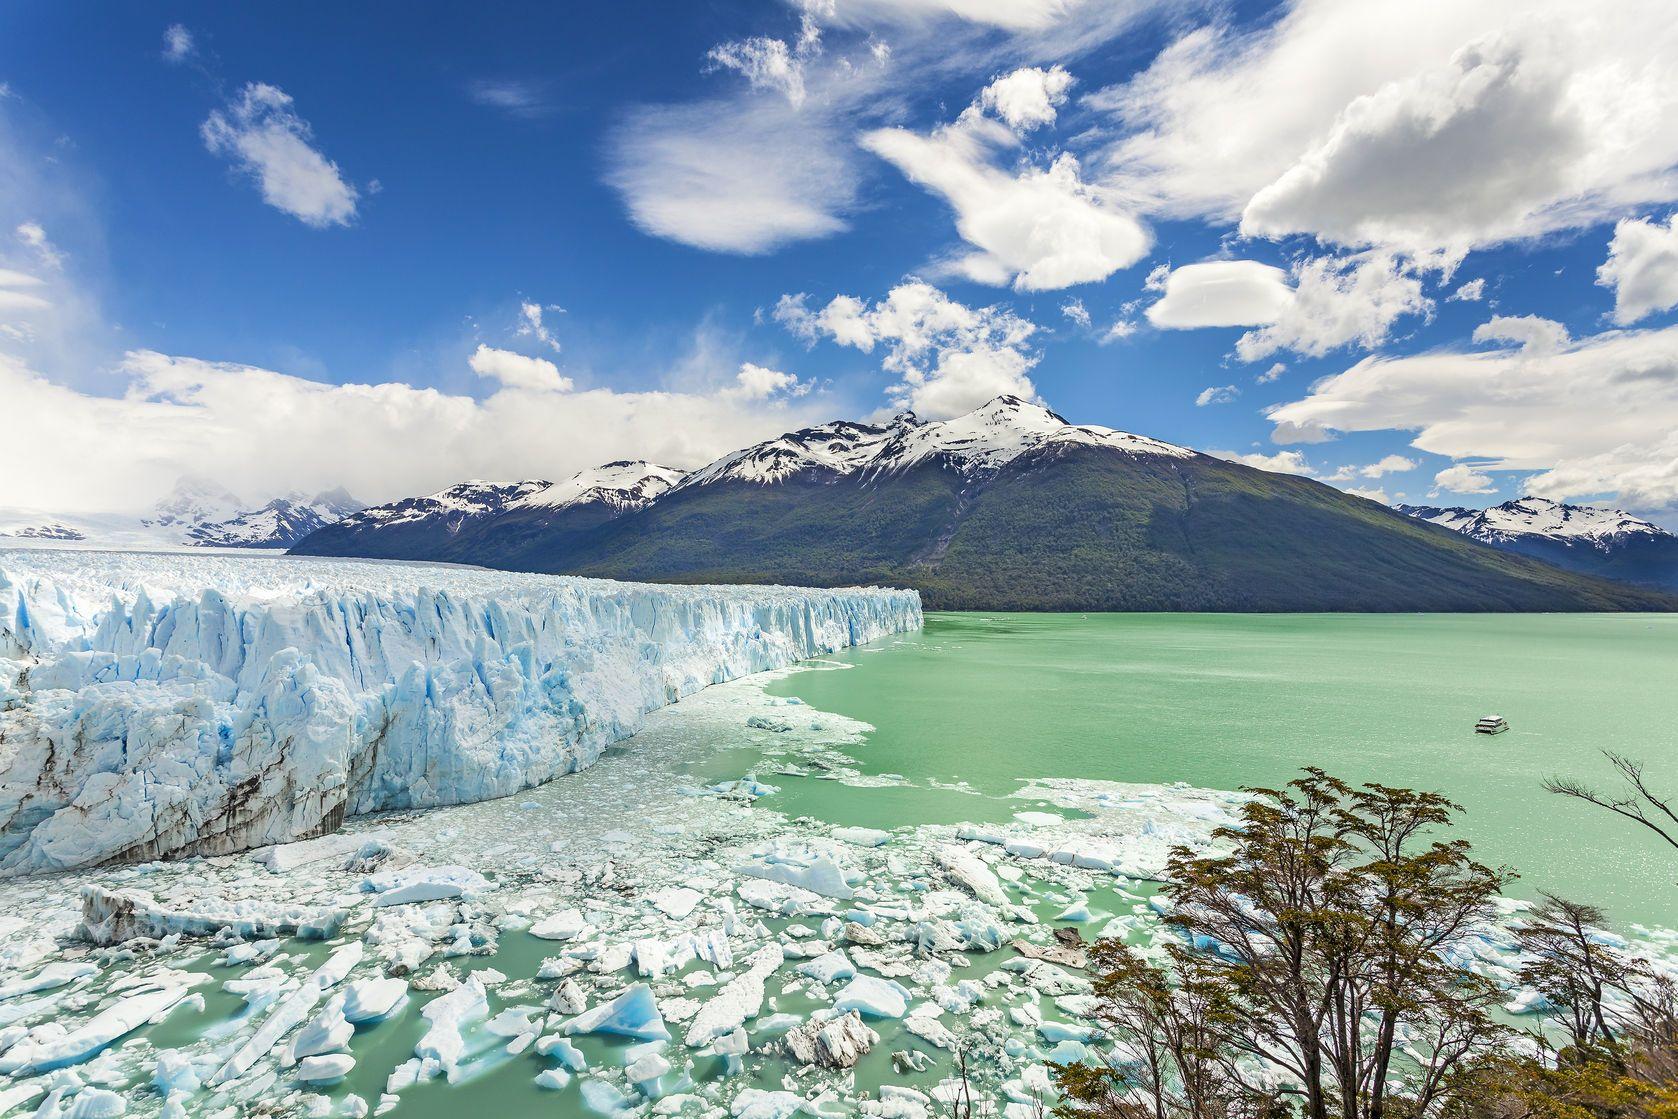 Ledovec Perito Moreno v národním parku Los Glaciares v Argentině | maciejbledowski/123RF.com